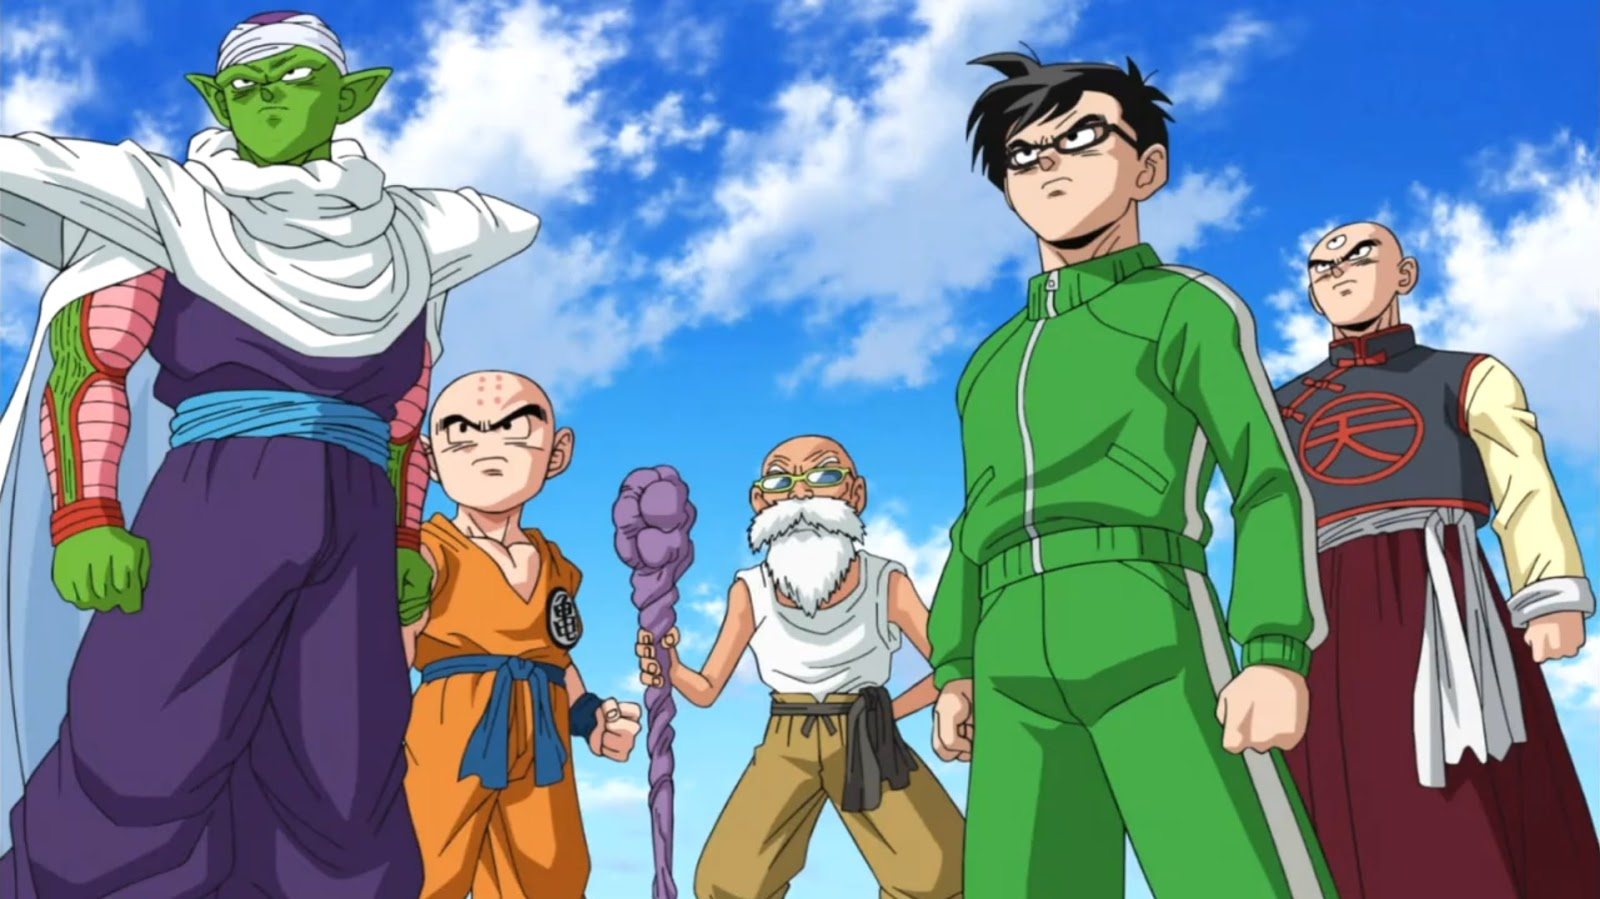 Dragon Ball Super: Episódio 20 – A Advertência de Jaco! O Exército de mil homens de Freeza se aproxima